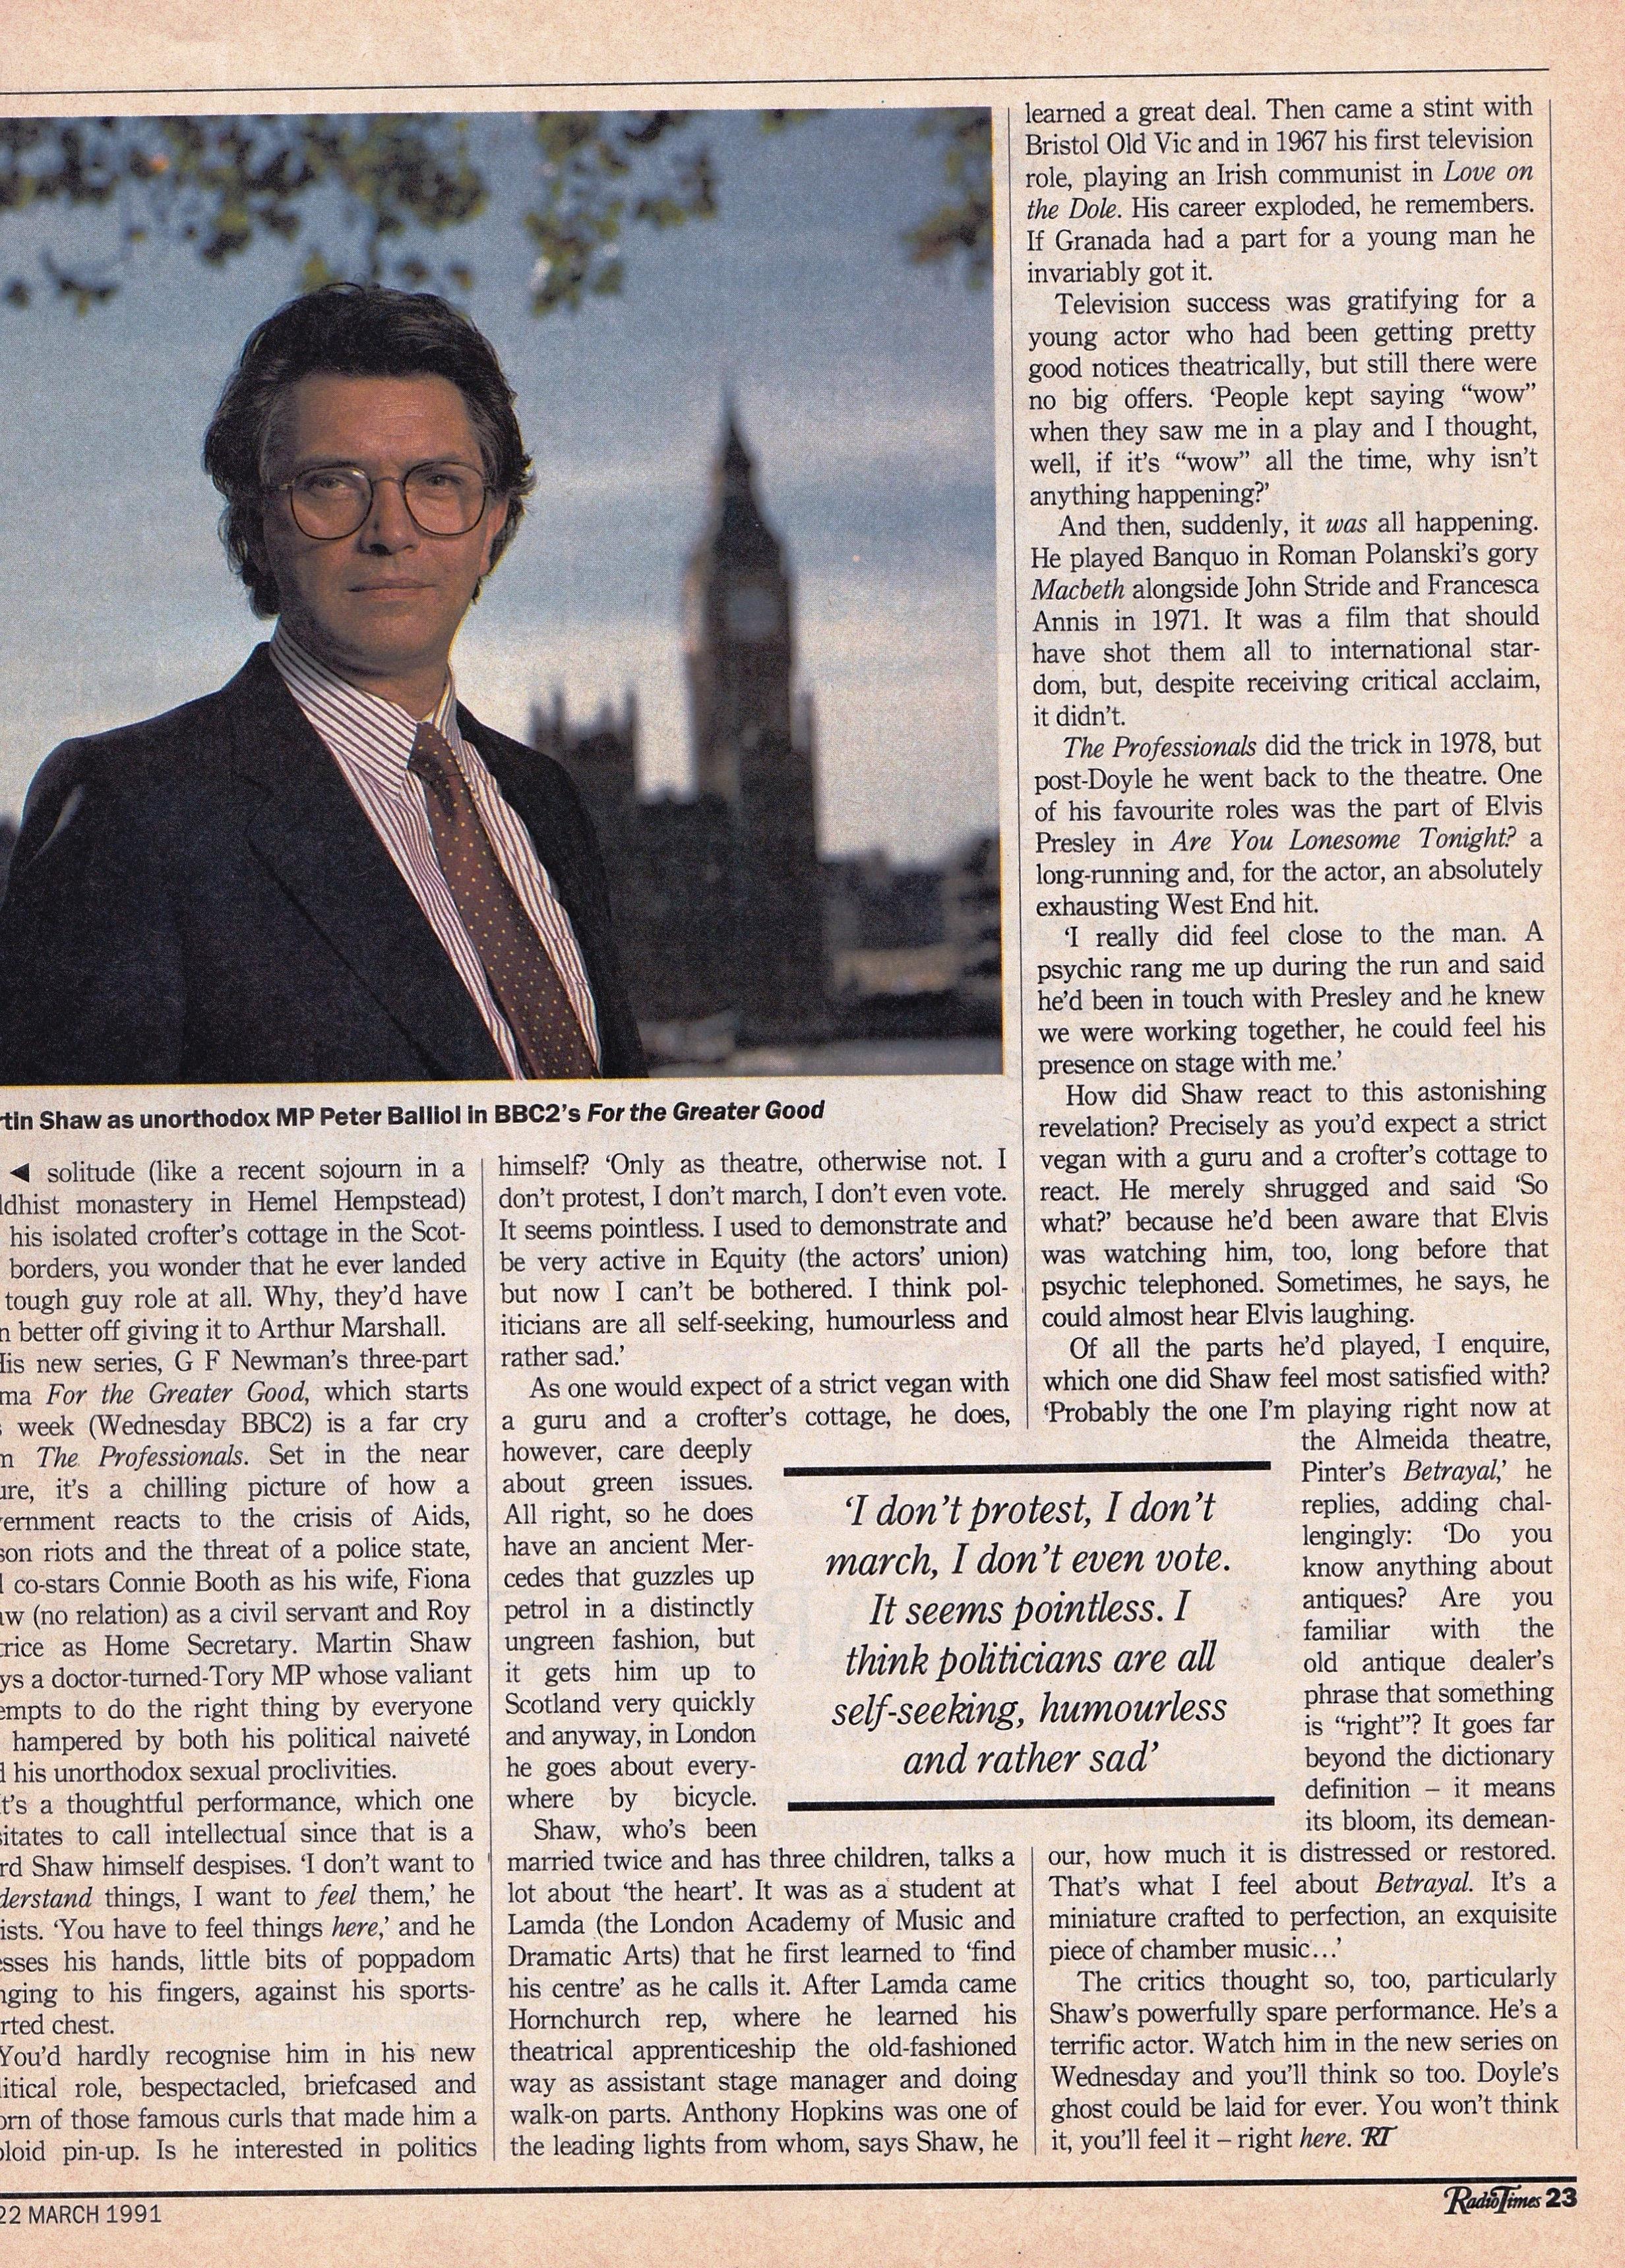 1991 MSRadioTimes03